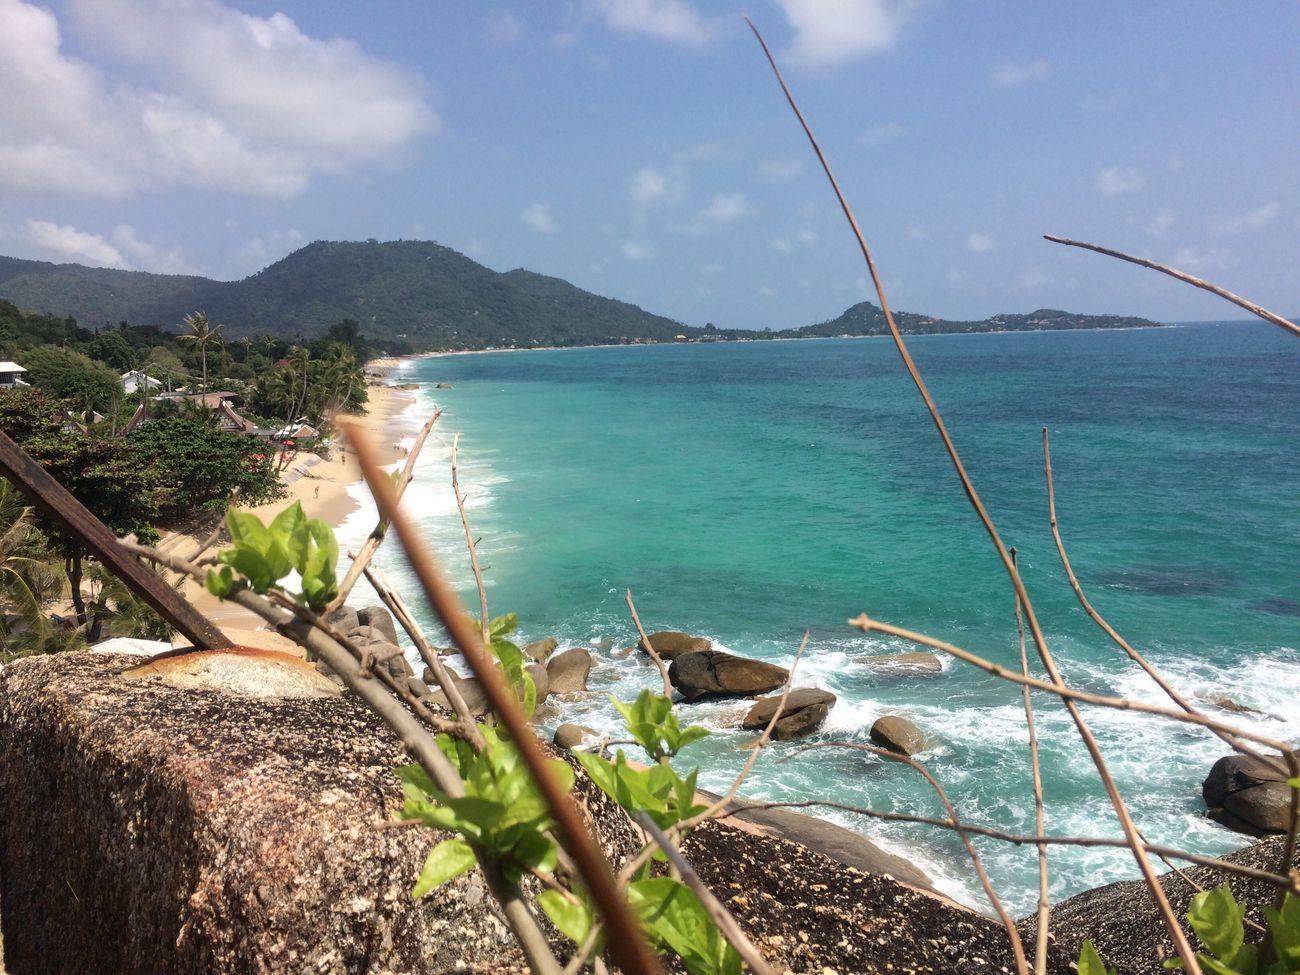 Sea Life Sea View 🌞🌞☁☁⛅⛅